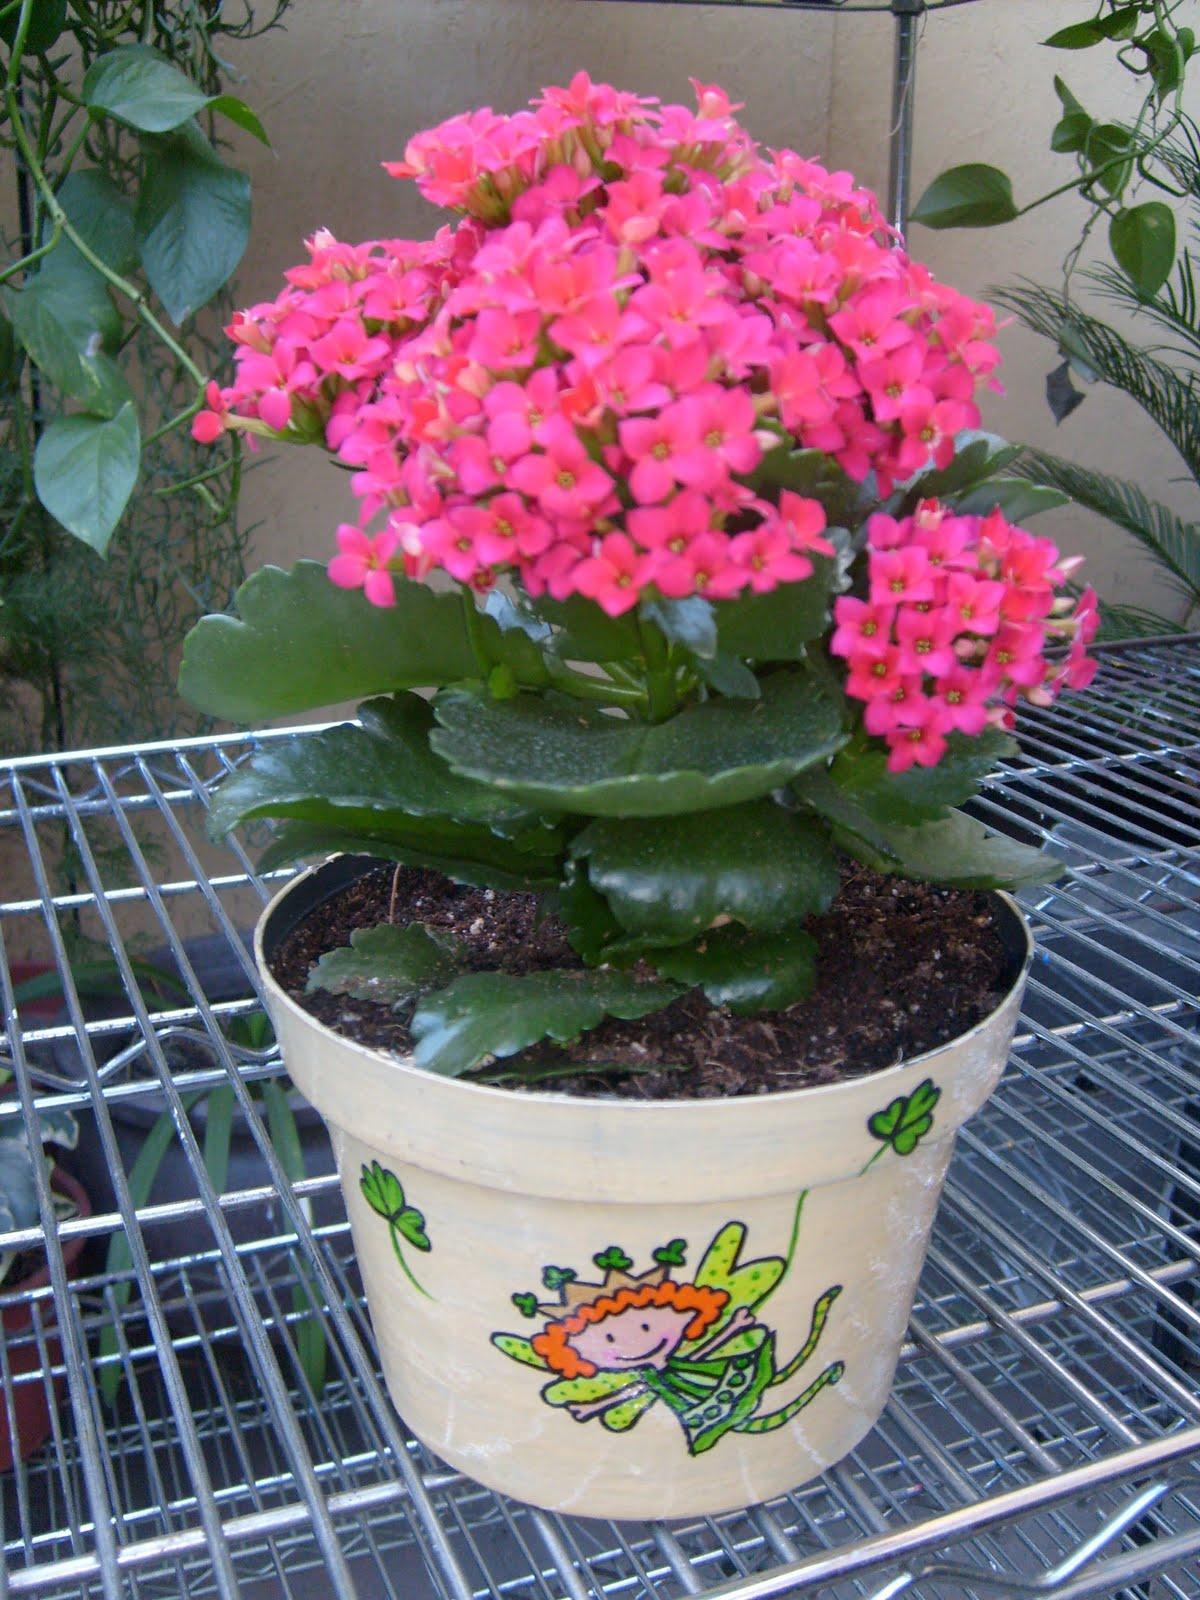 Macetas mexicanas prindorns centros de mesa for Centros de mesa con plantas naturales